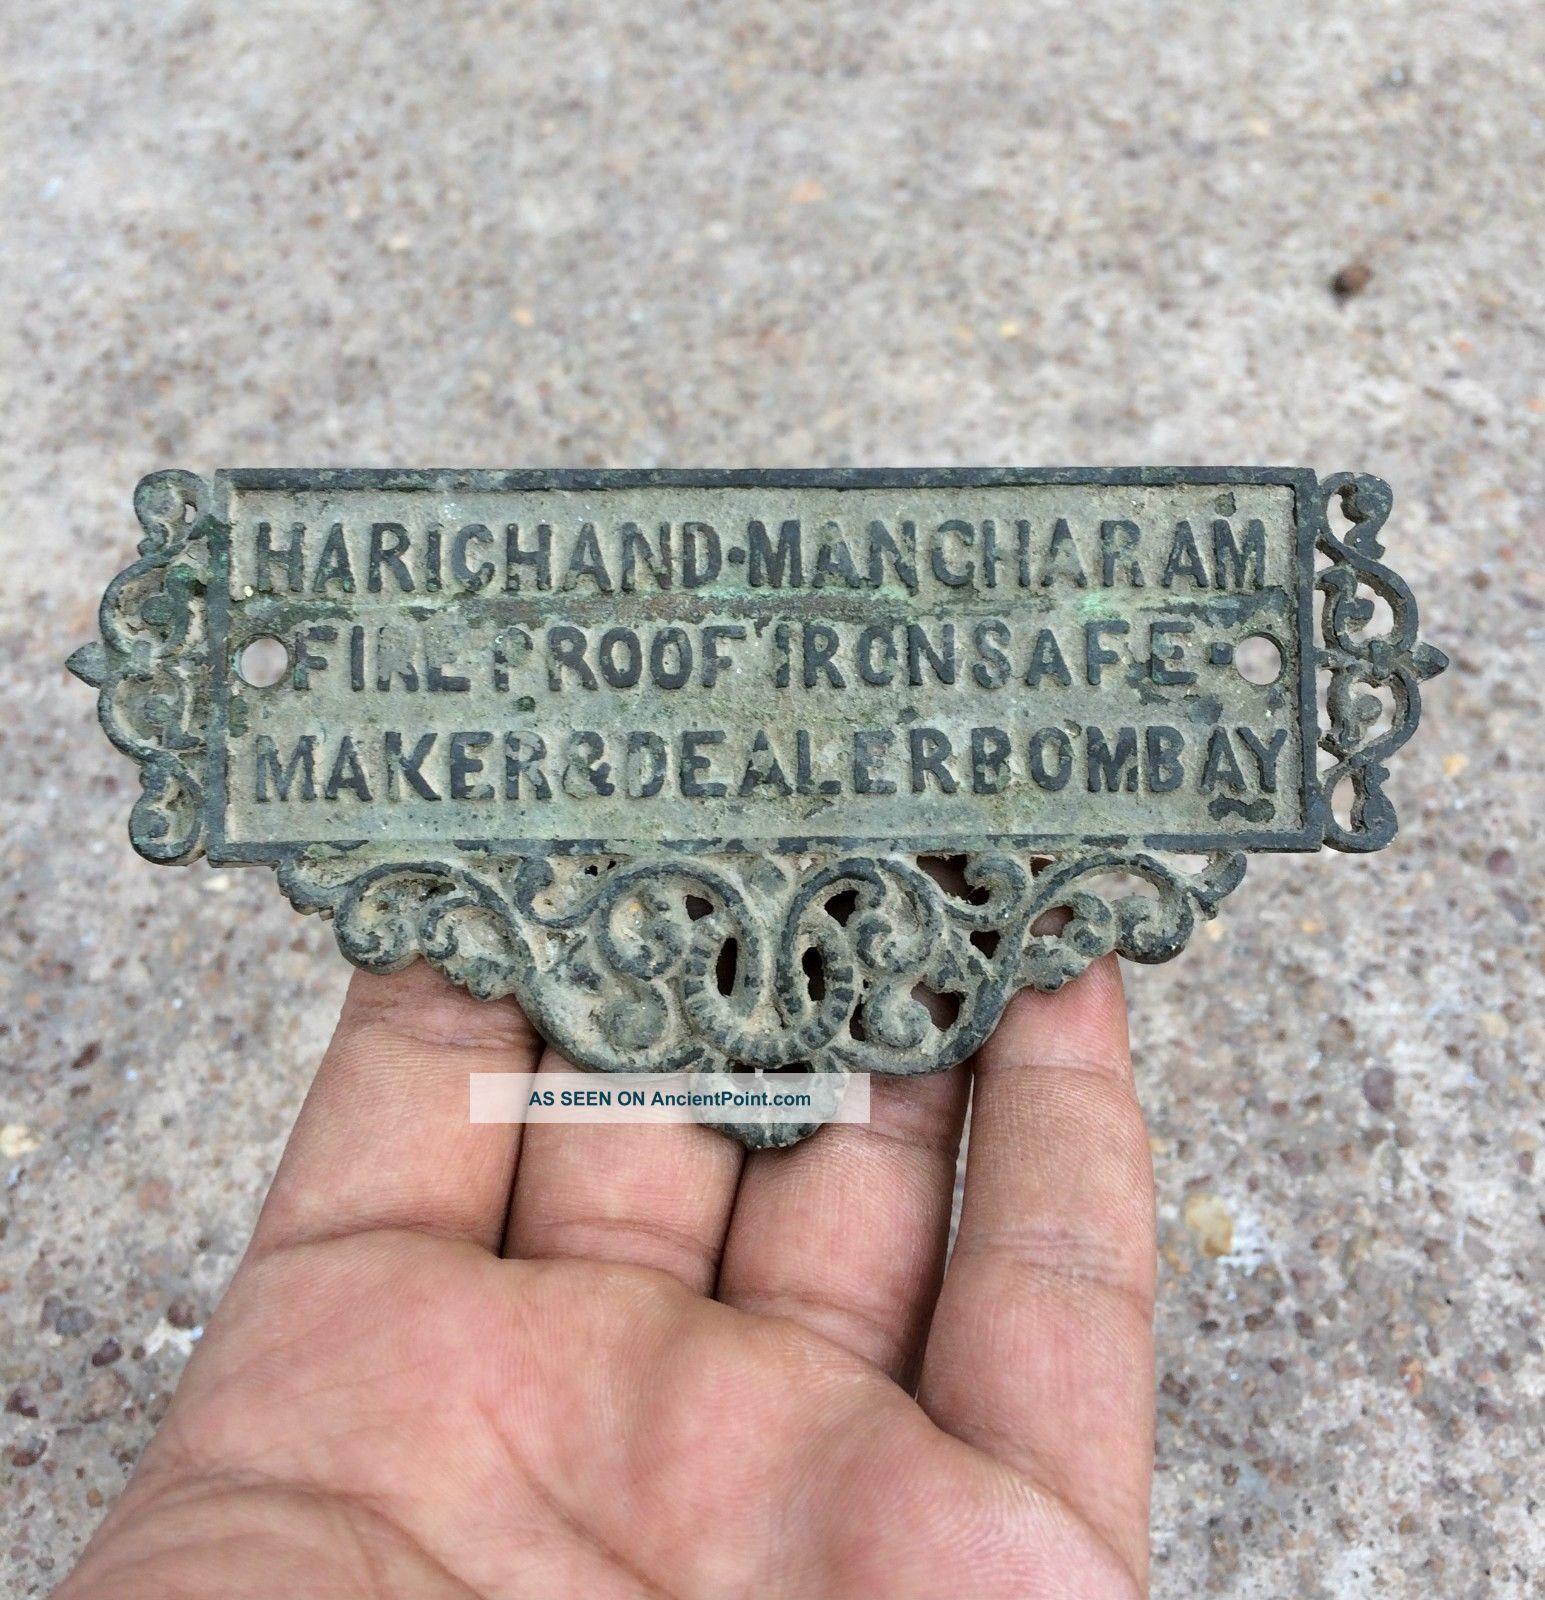 1940 ' S Vintage Harichand - Mancharam Fire Proof Iron Safe Mark Brass Safe ' S Plate Safes & Still Banks photo